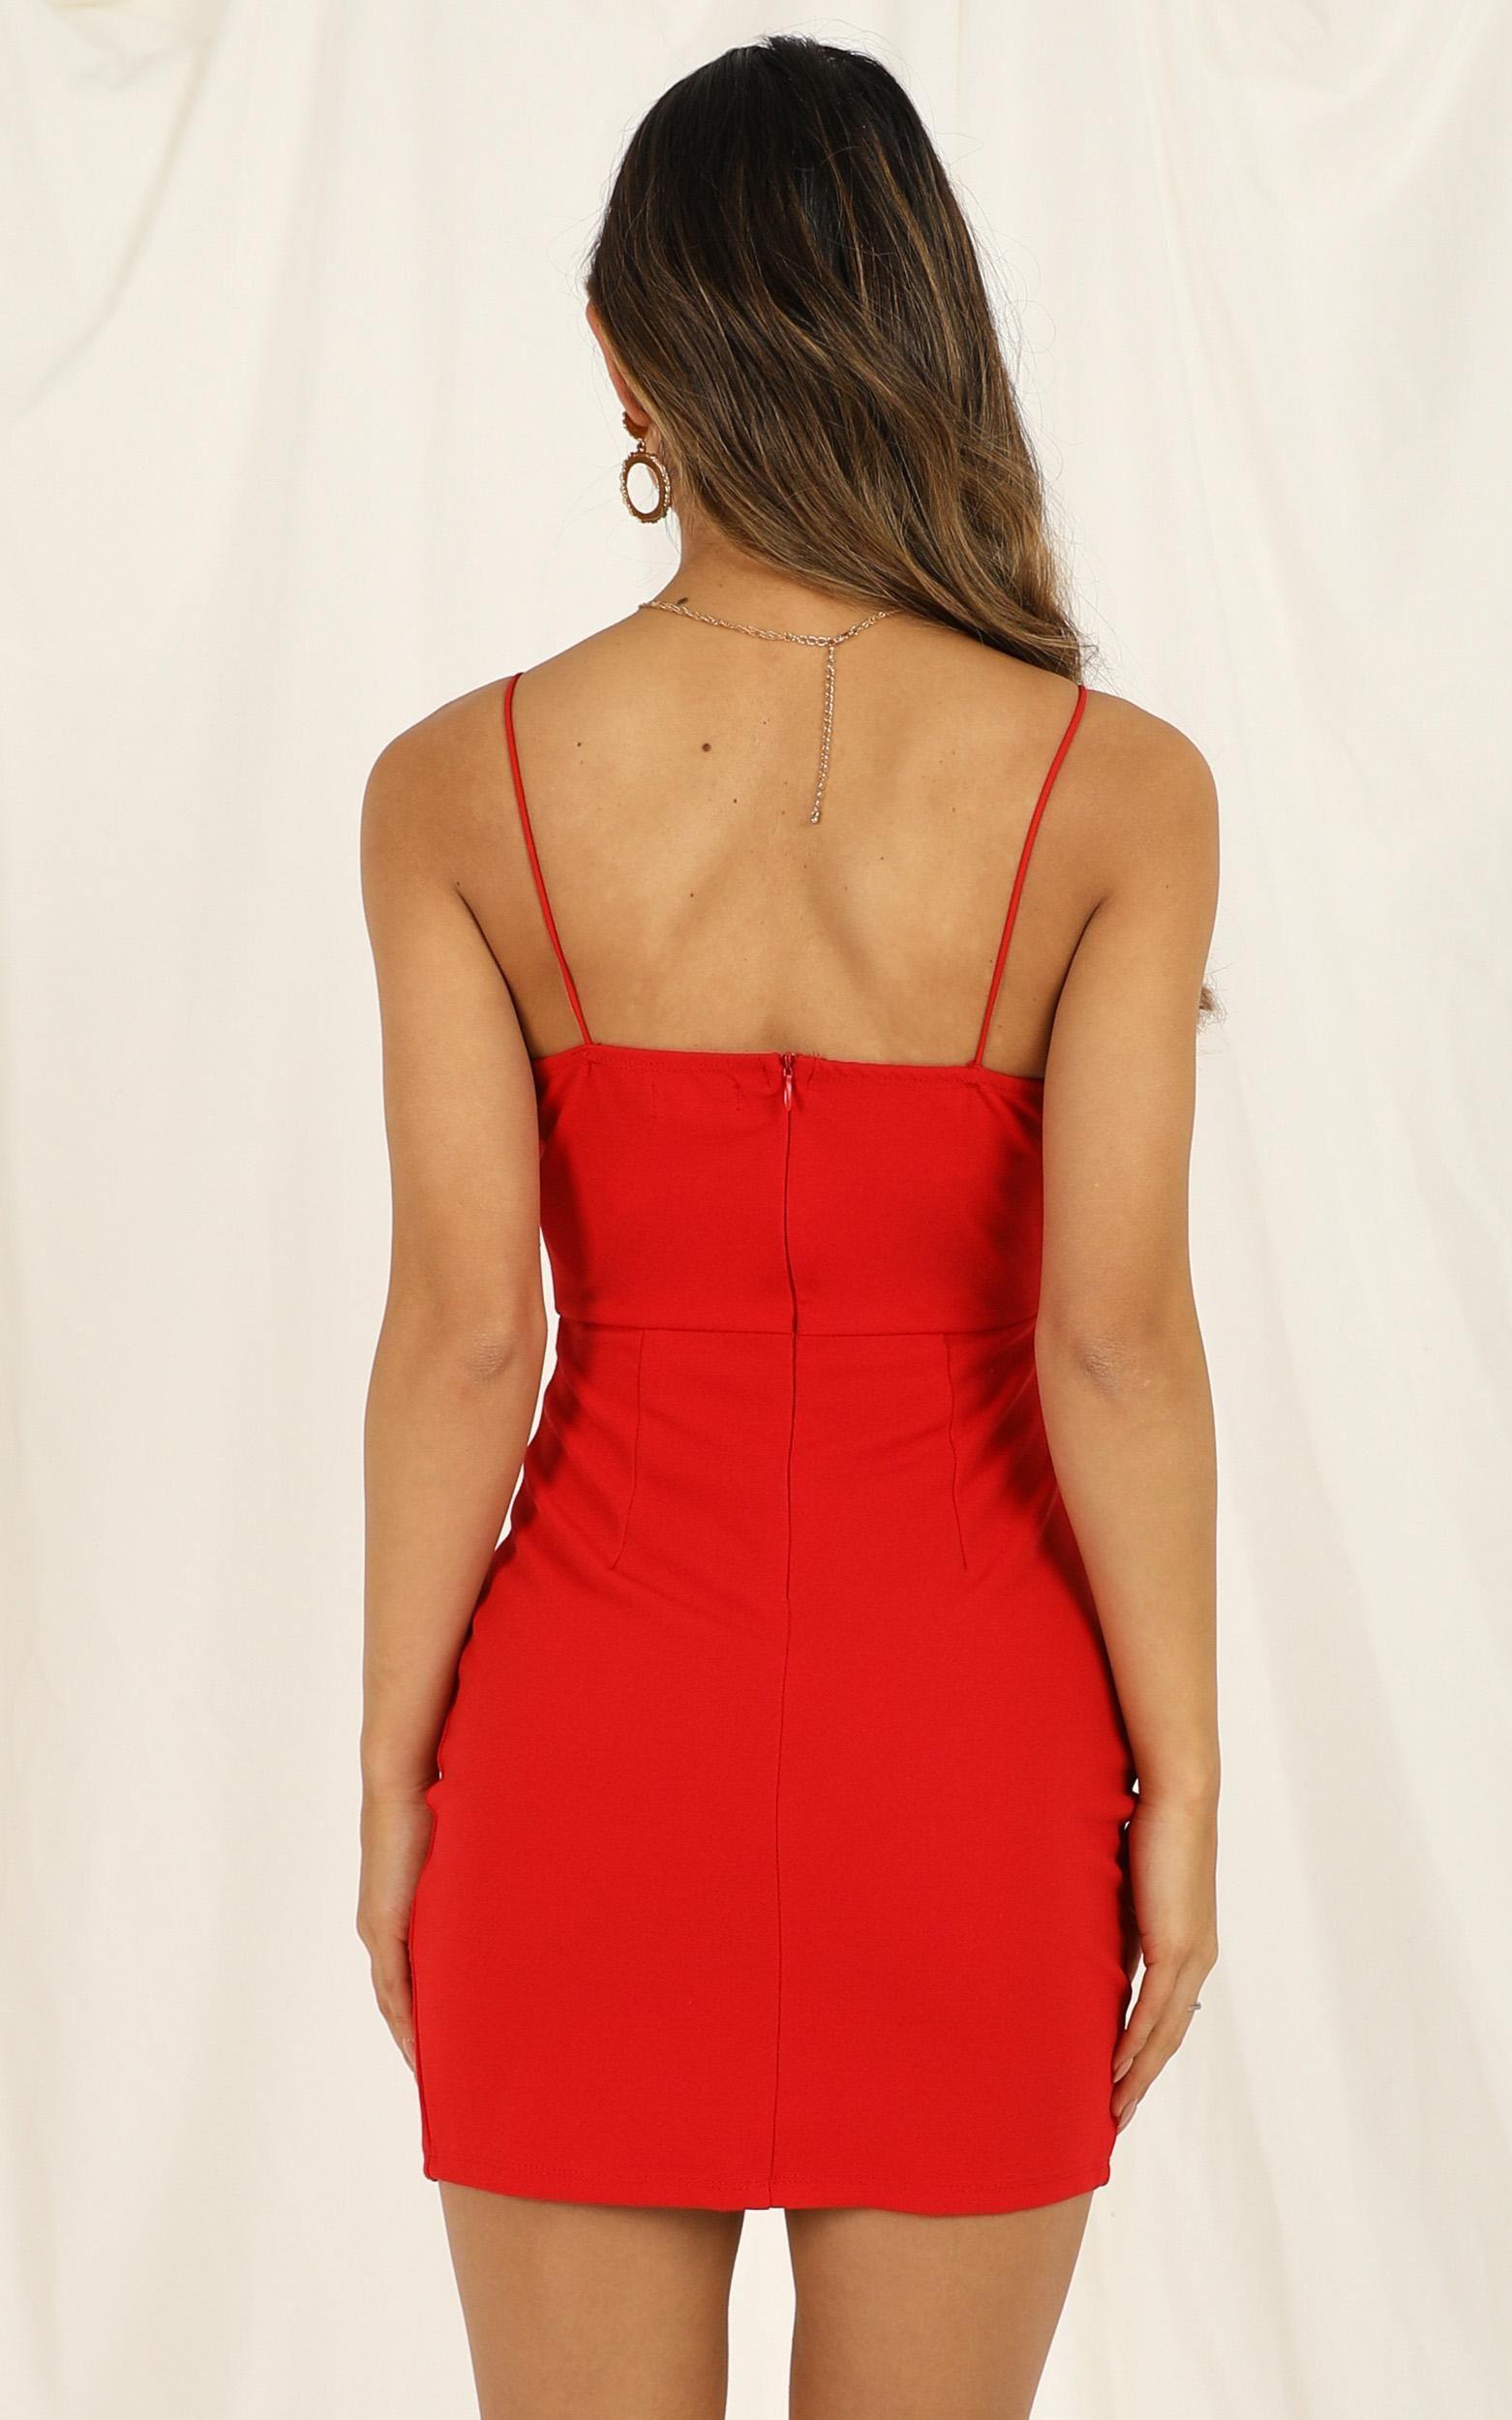 My Whole Heart Dress in Red | Showpo